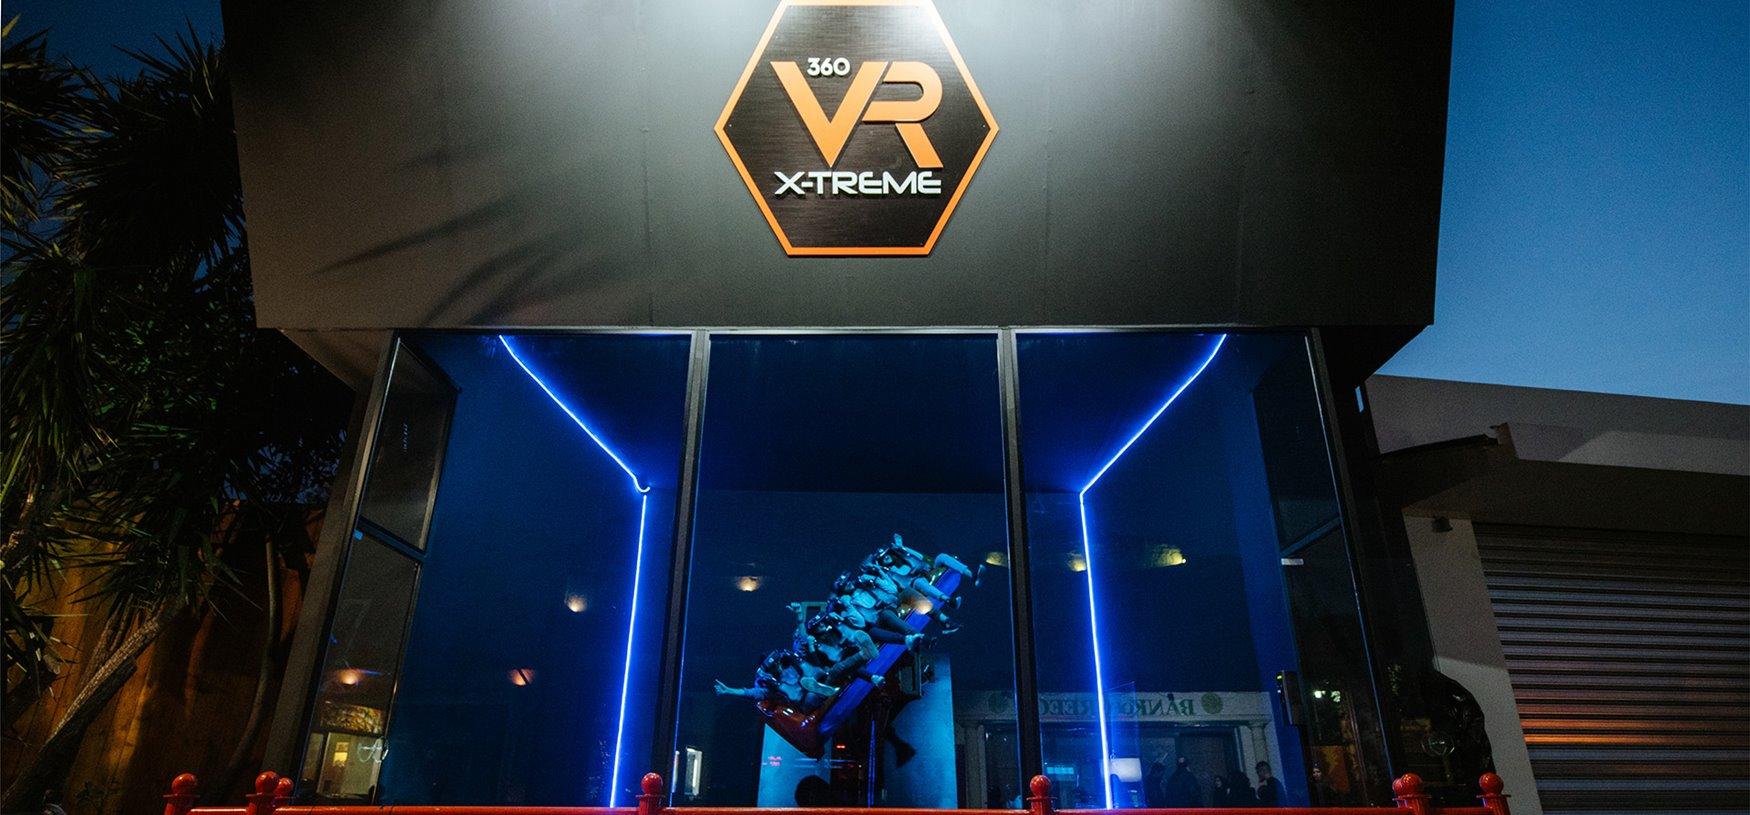 360 VR X-TREME